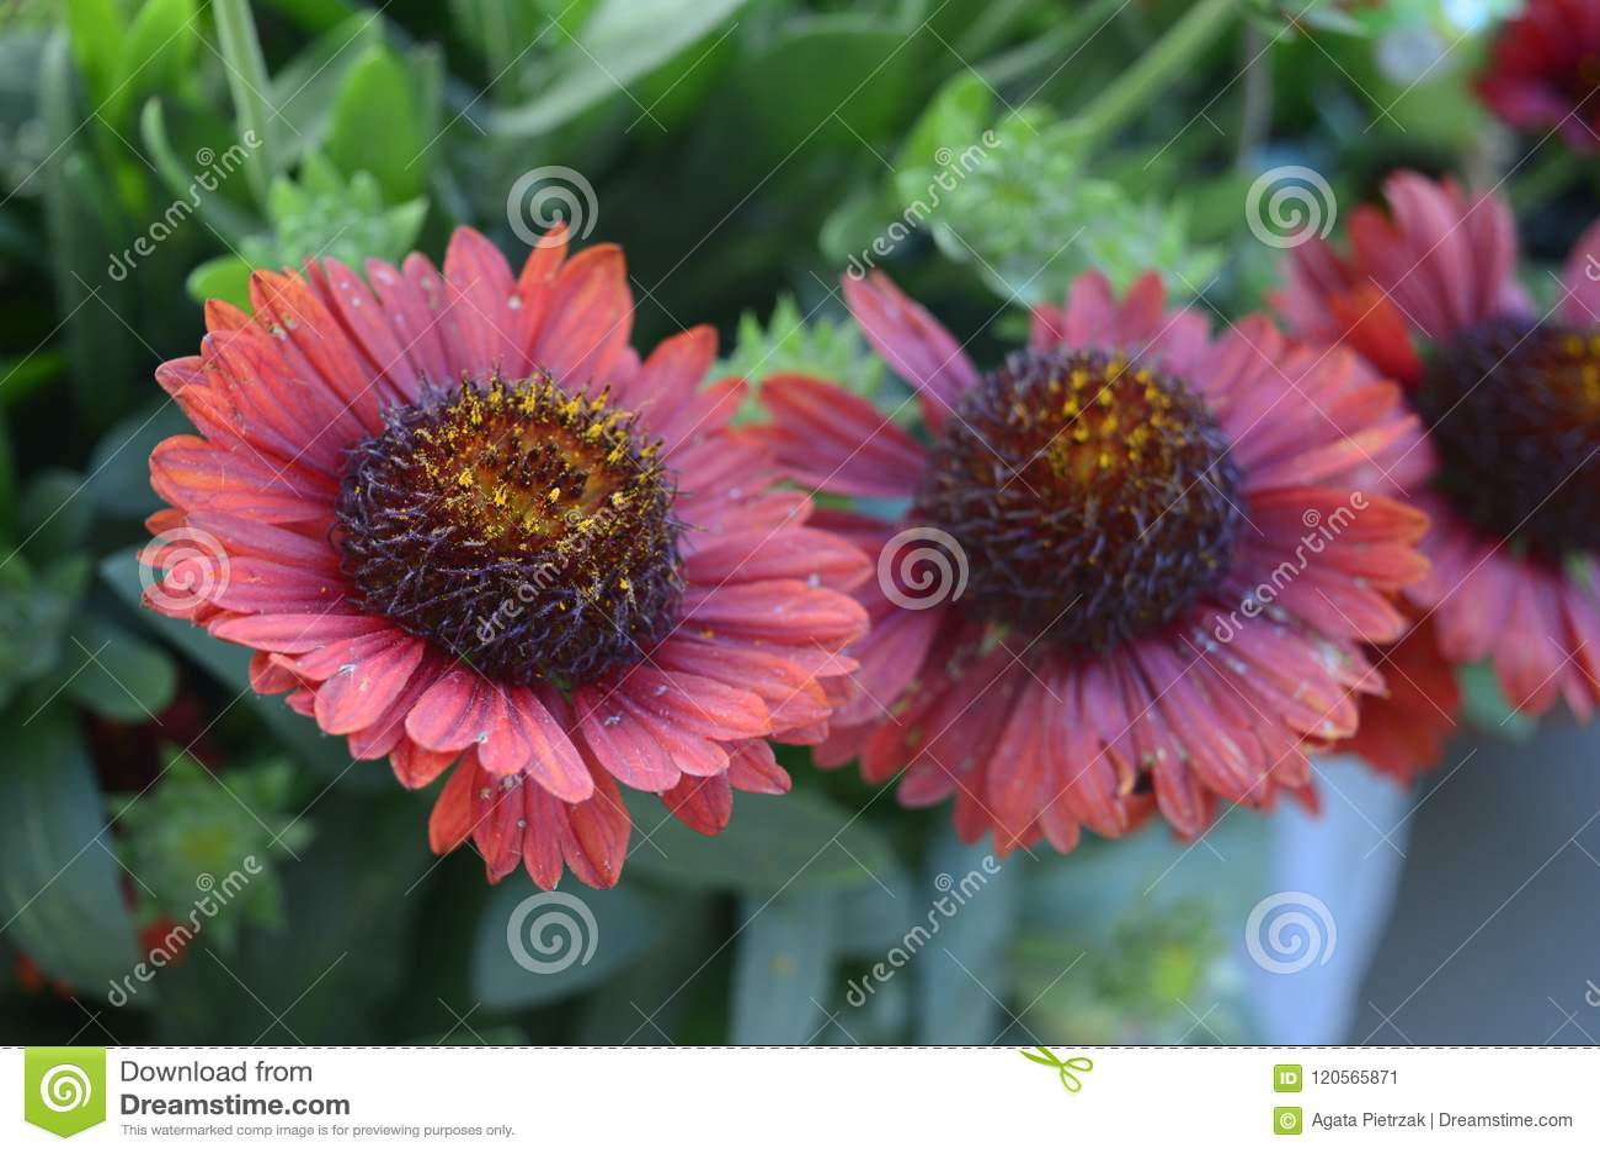 Ommon Blanketflower Or Common Gaillardia Stock Image Image Of